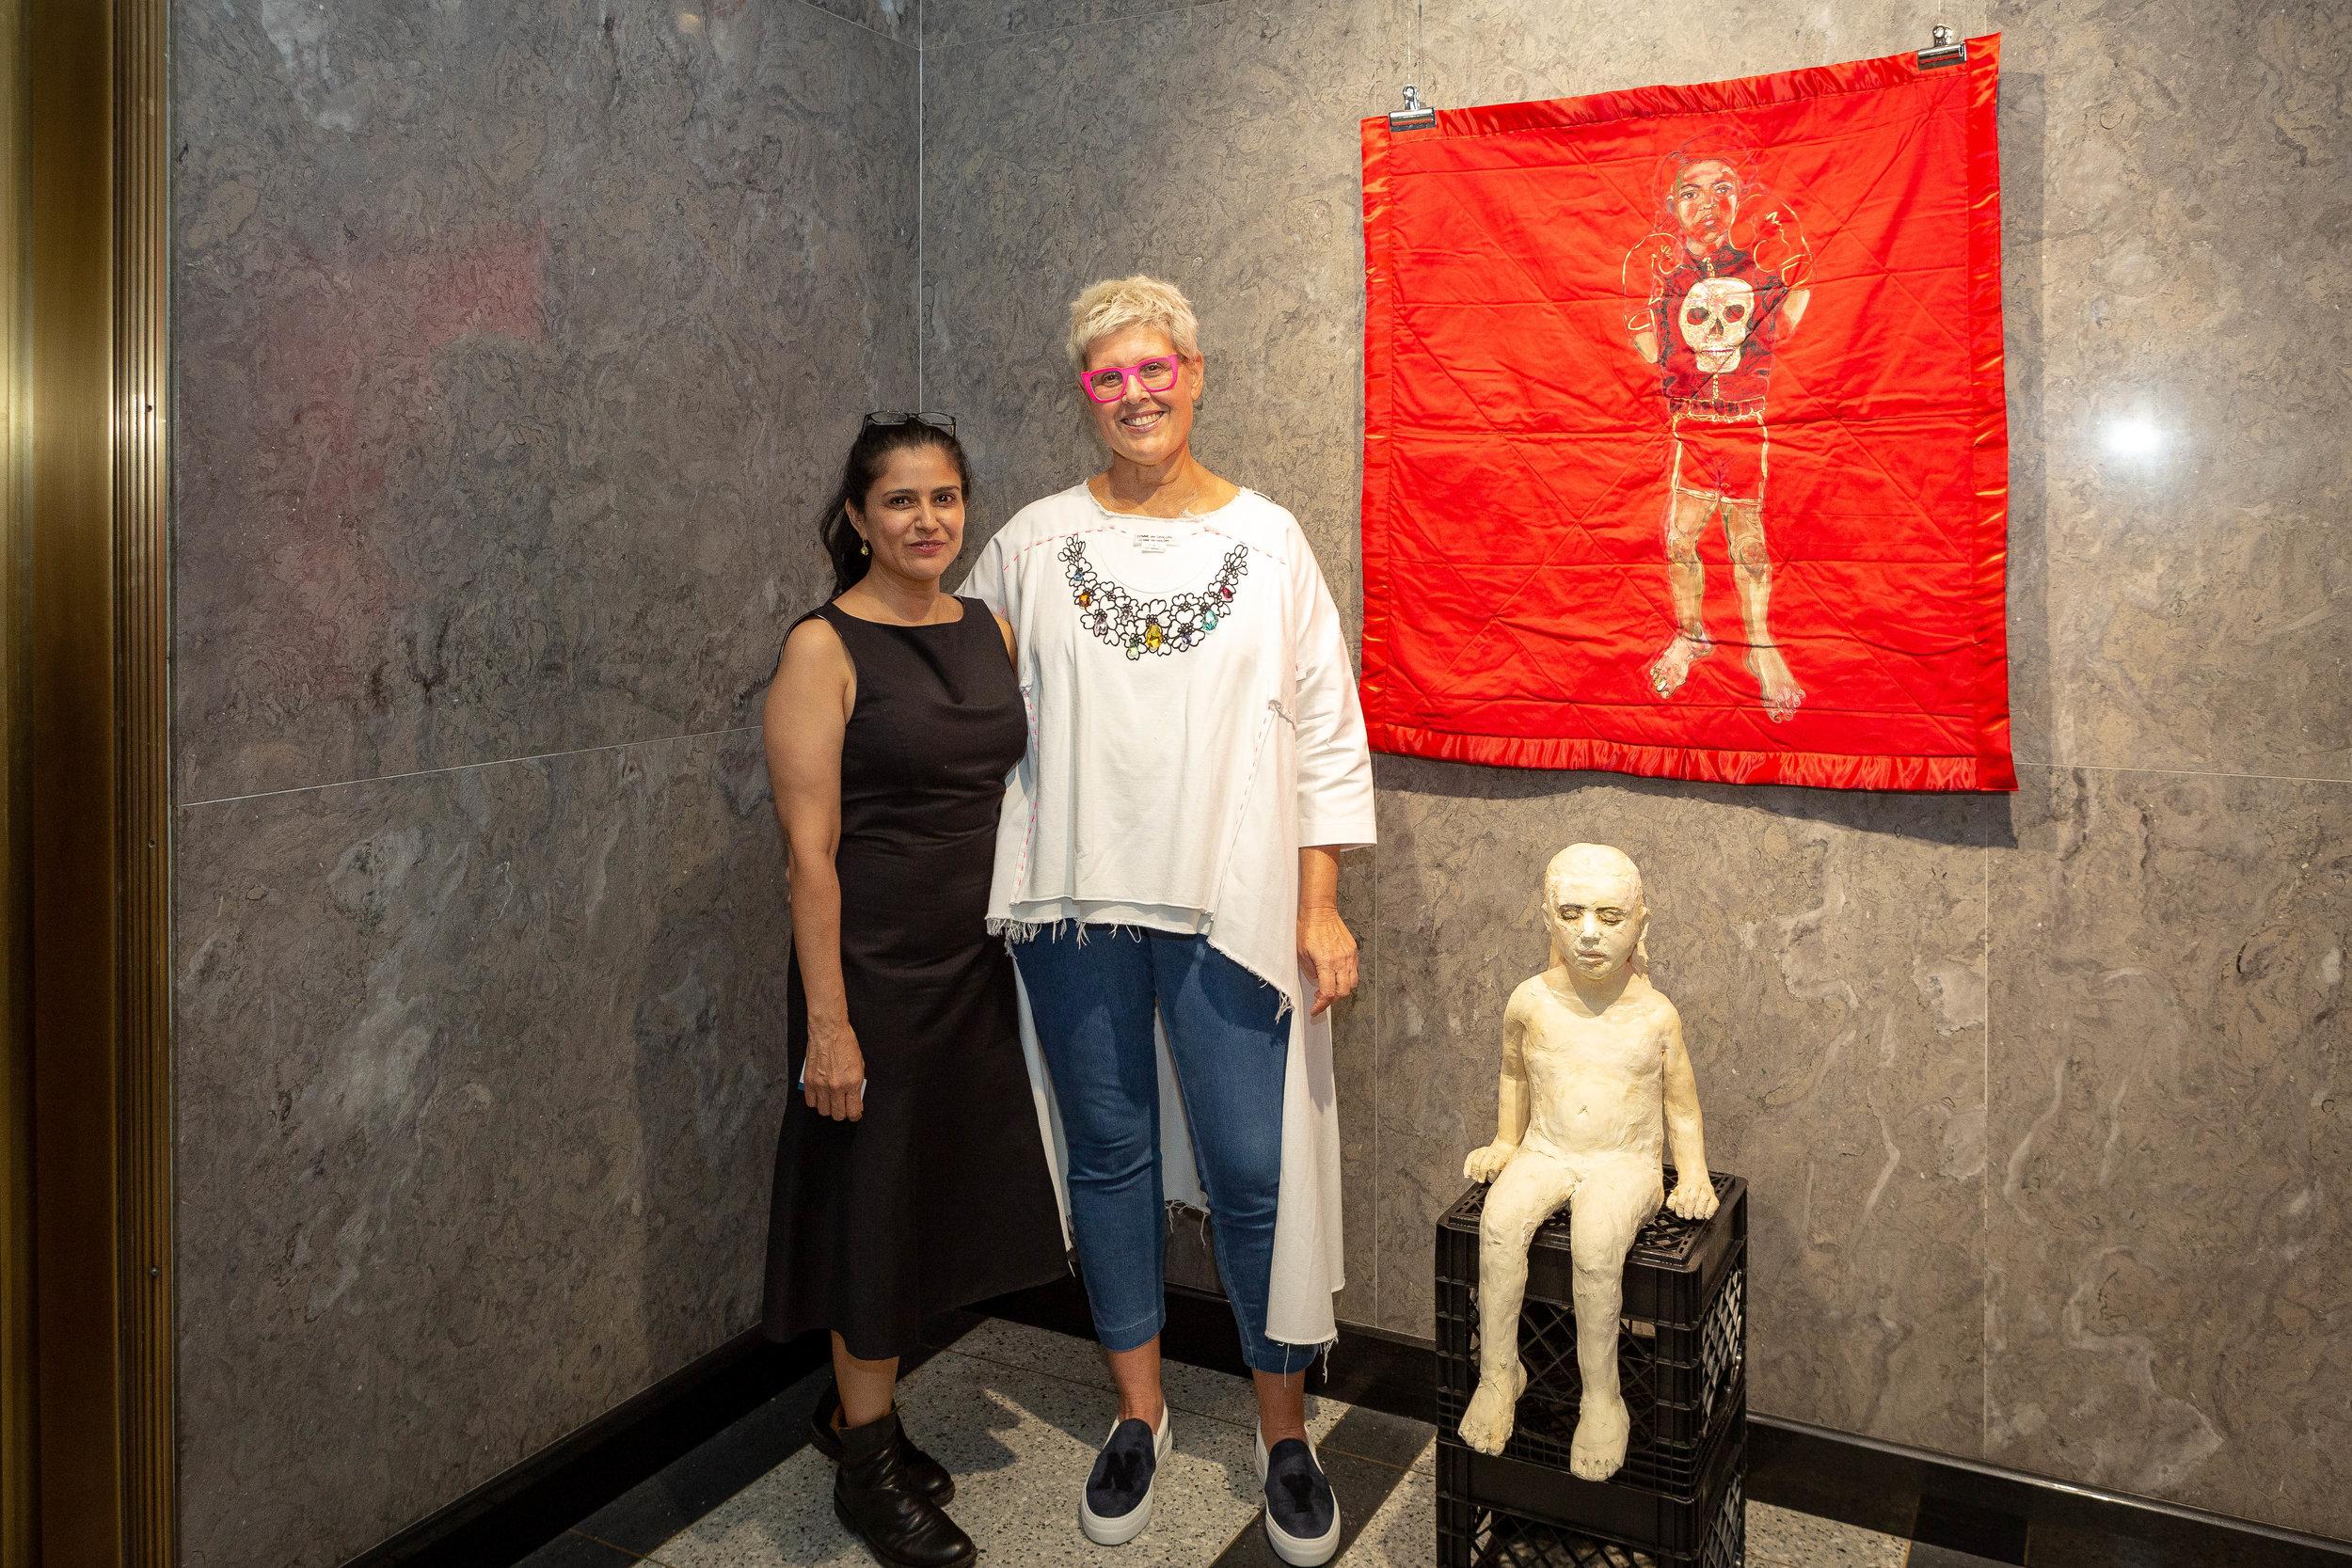 Claudia Alvarez & Tzili Charney